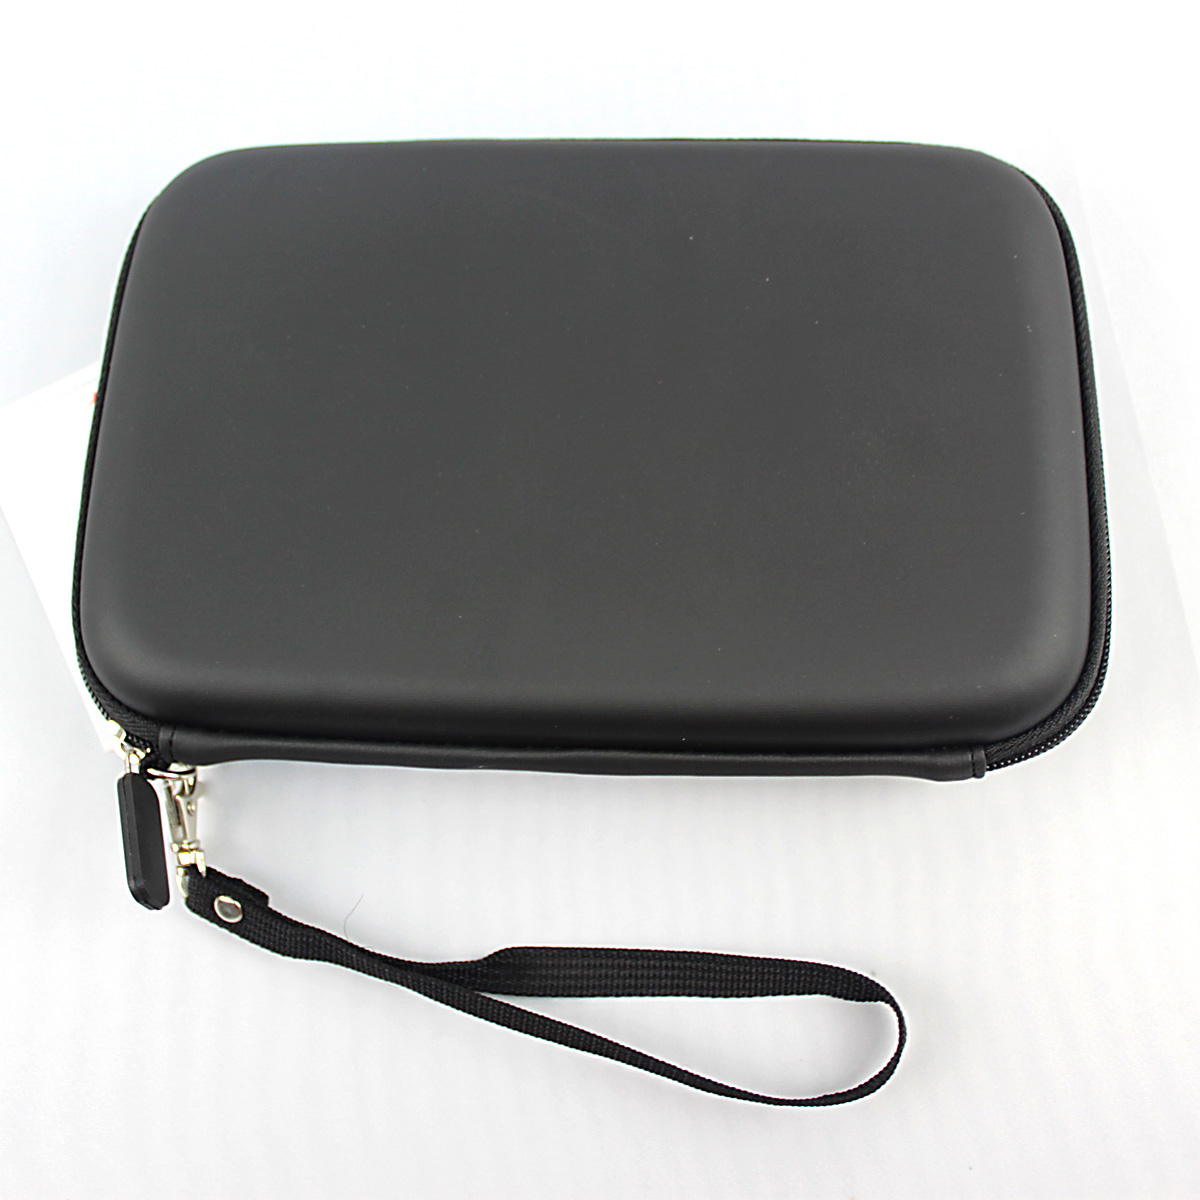 EVA tablet case